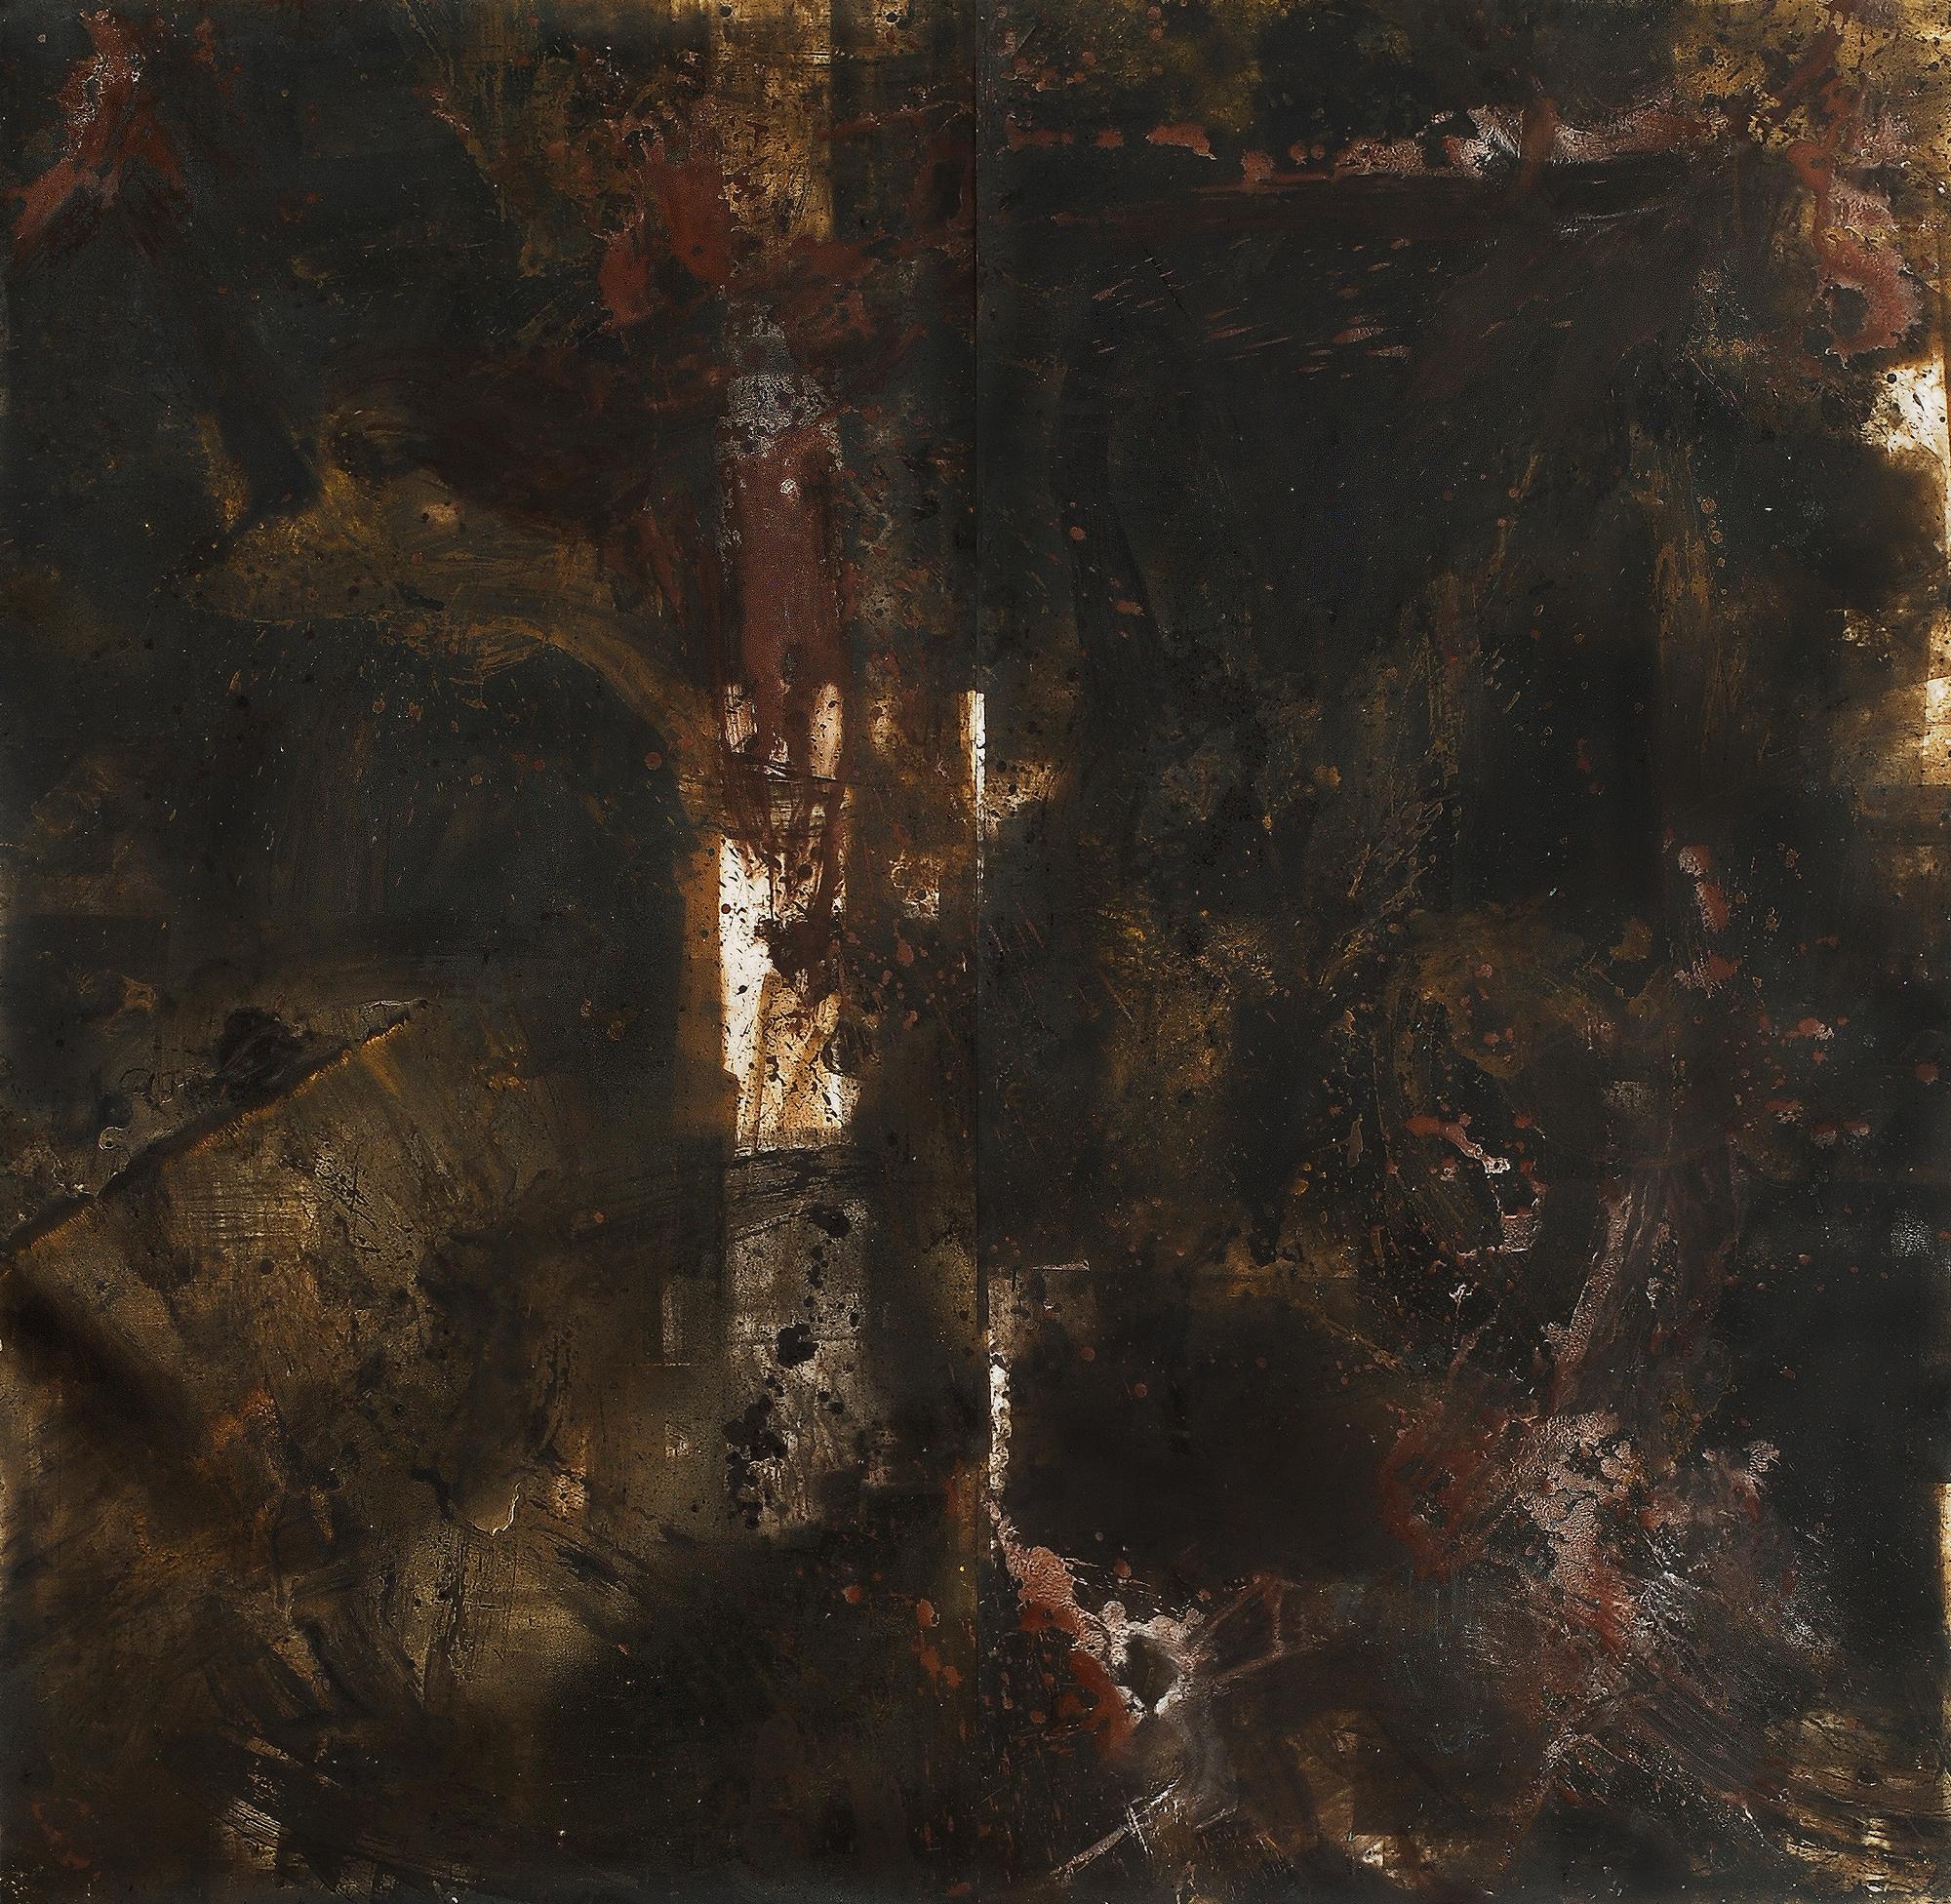 Untitled 03, 2011